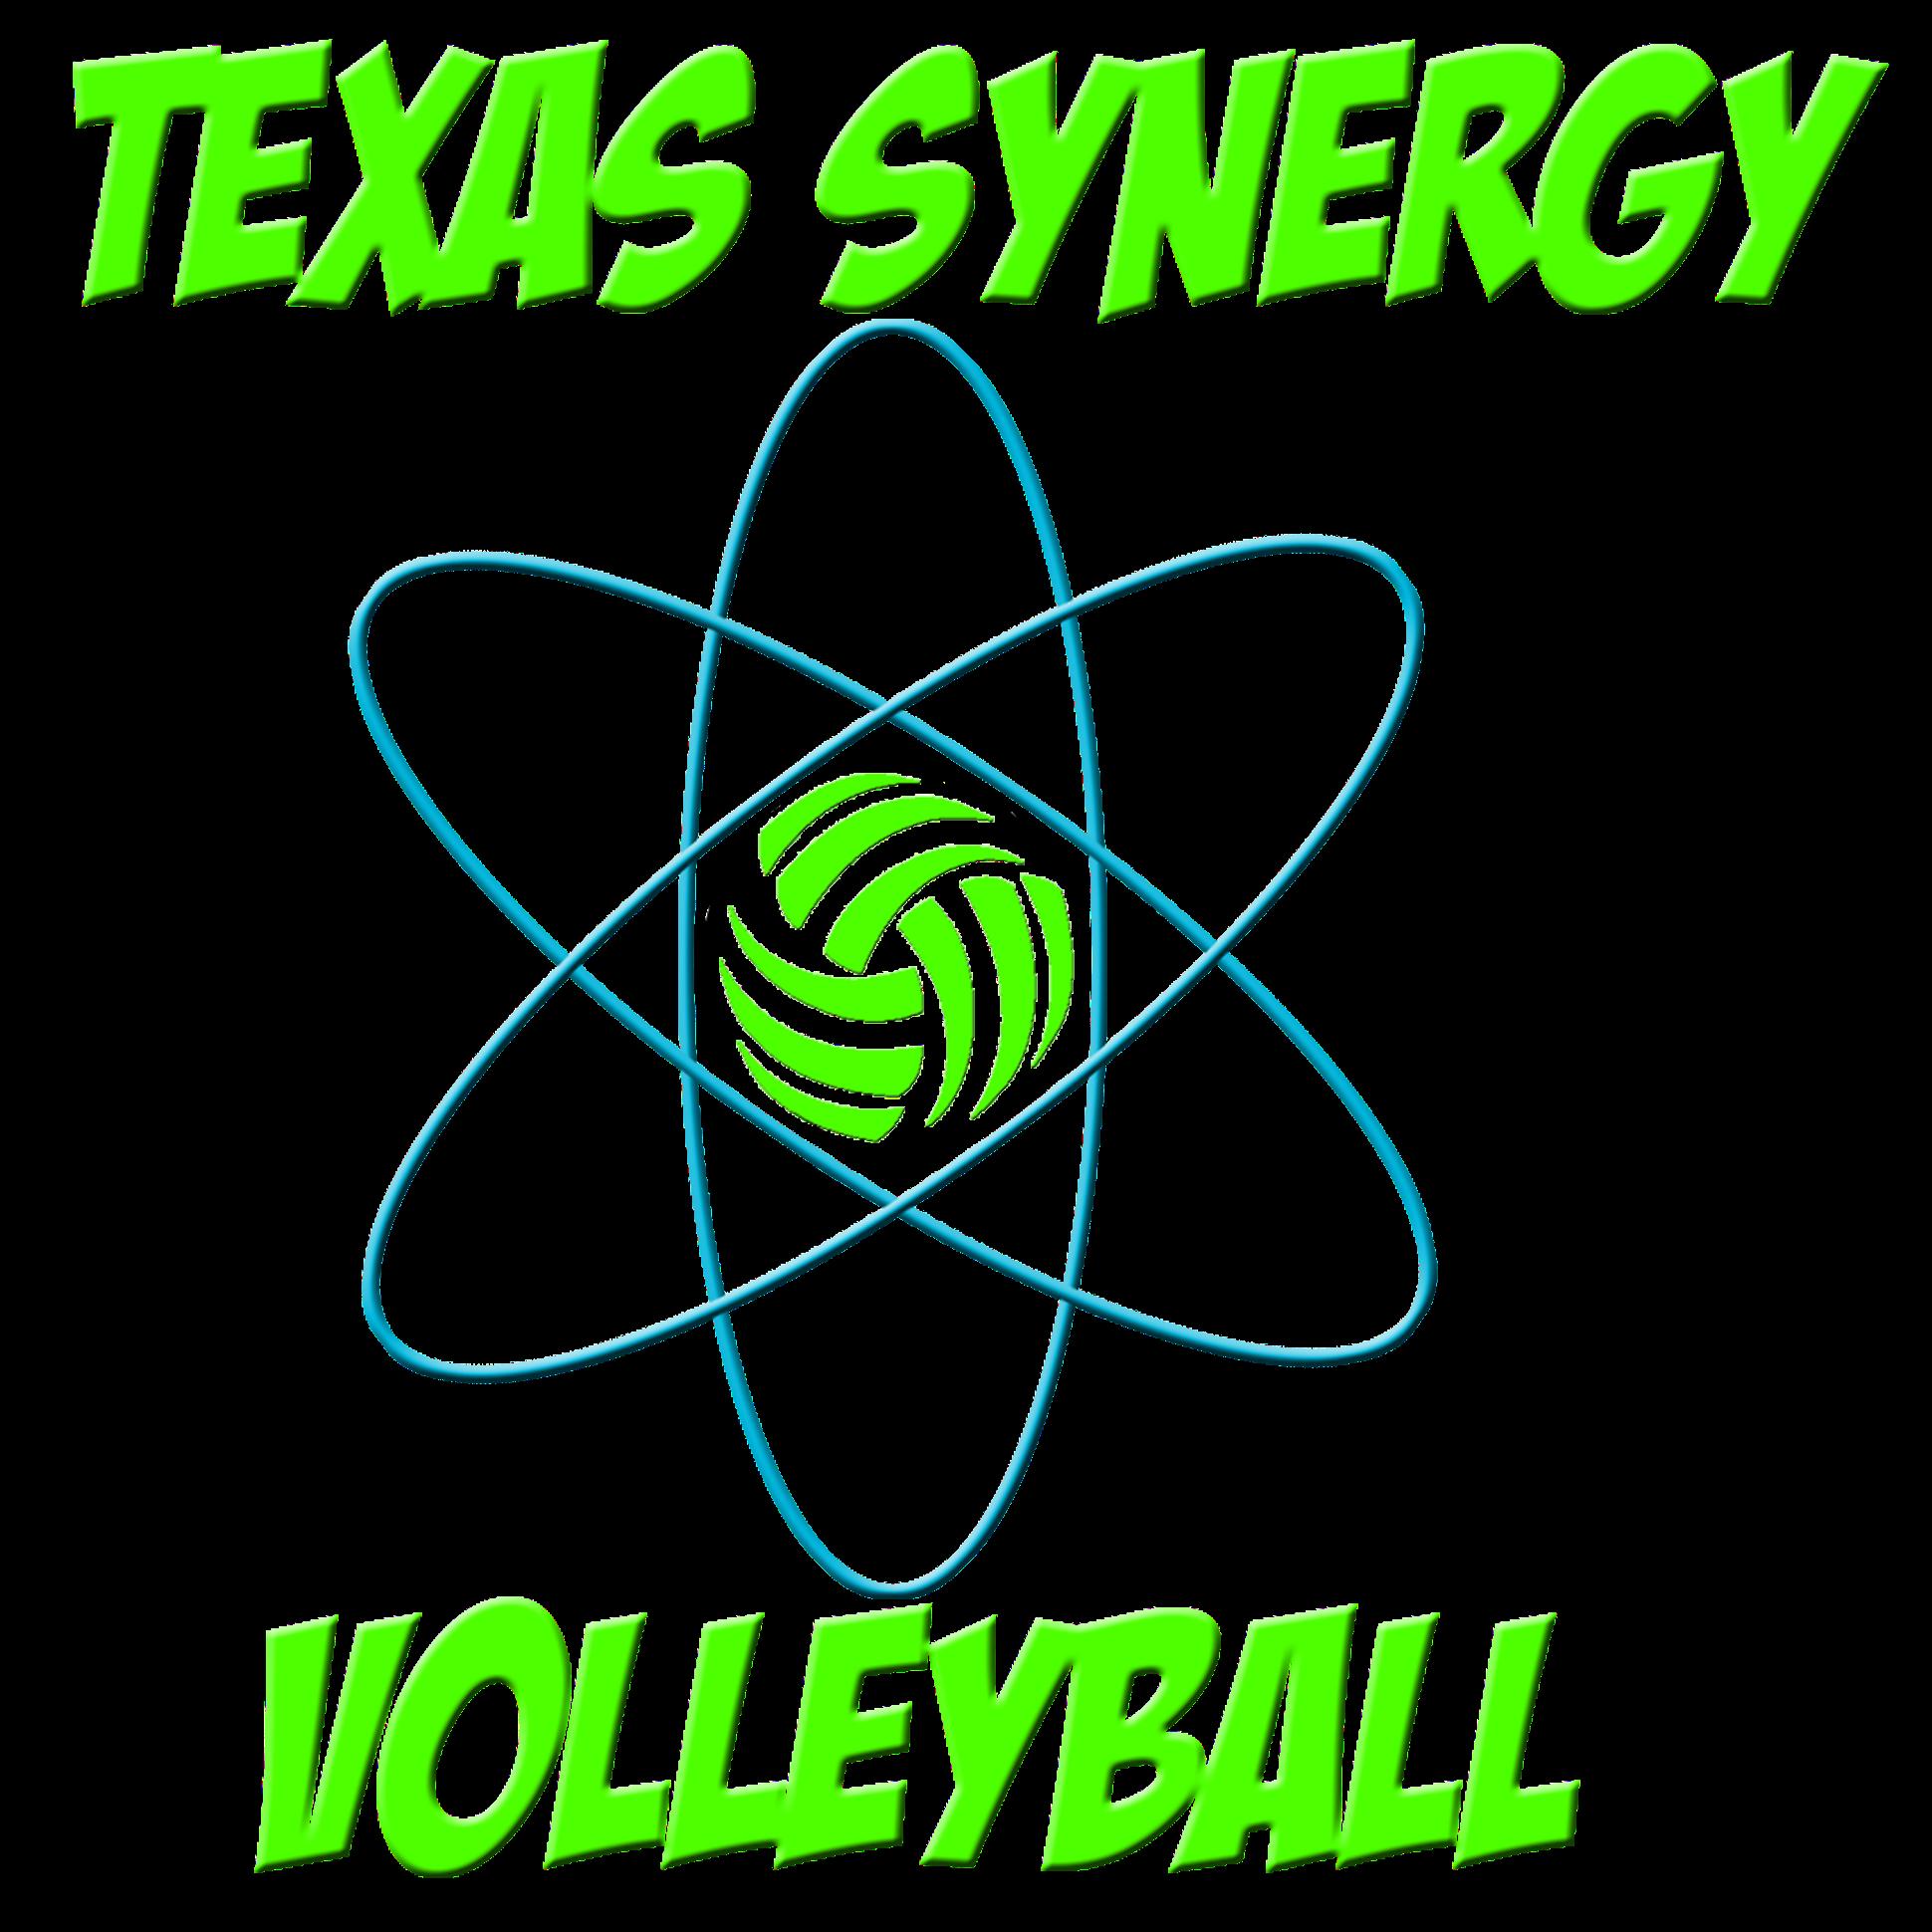 Texas Synergy Volleyball